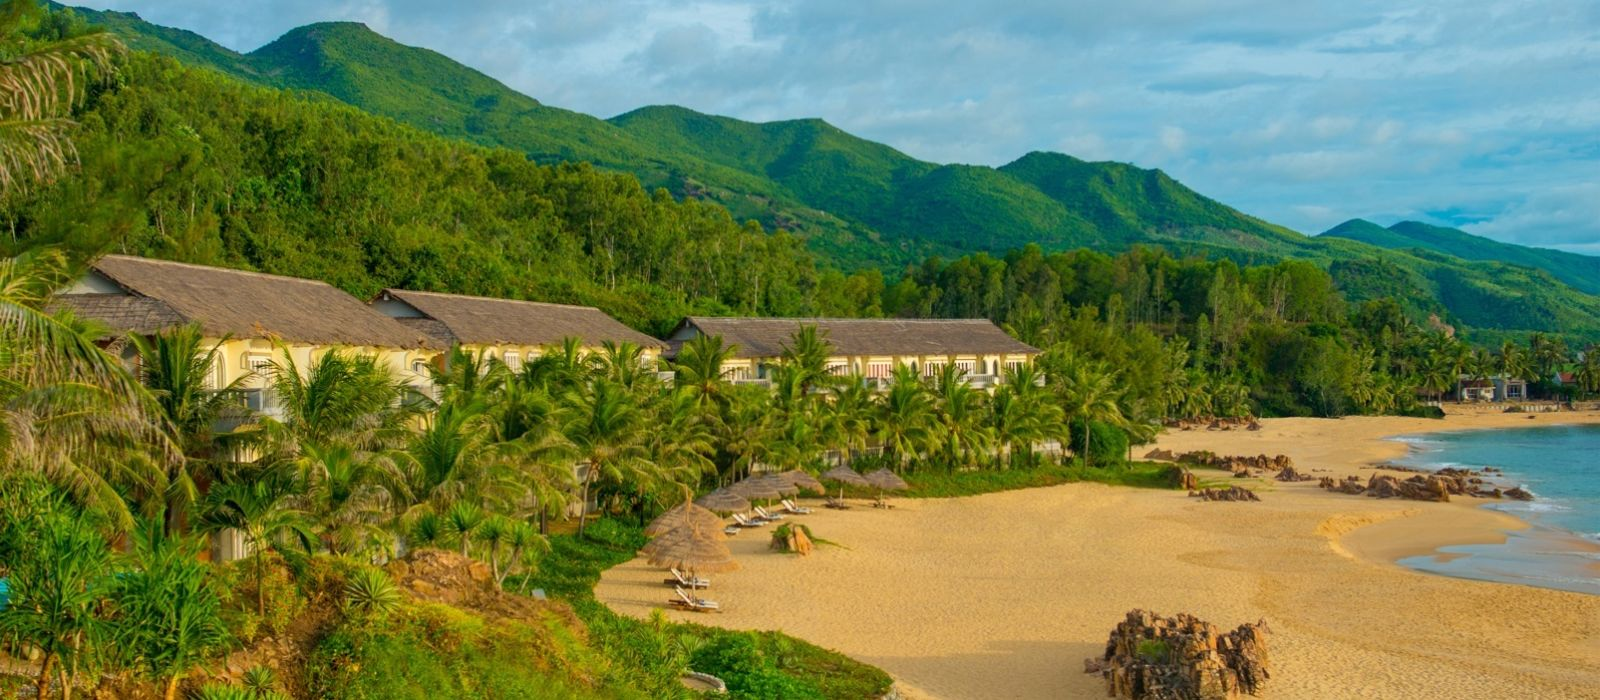 Hotel Avani Quy Nhon Resort & Spa (Qui Nhon) Vietnam